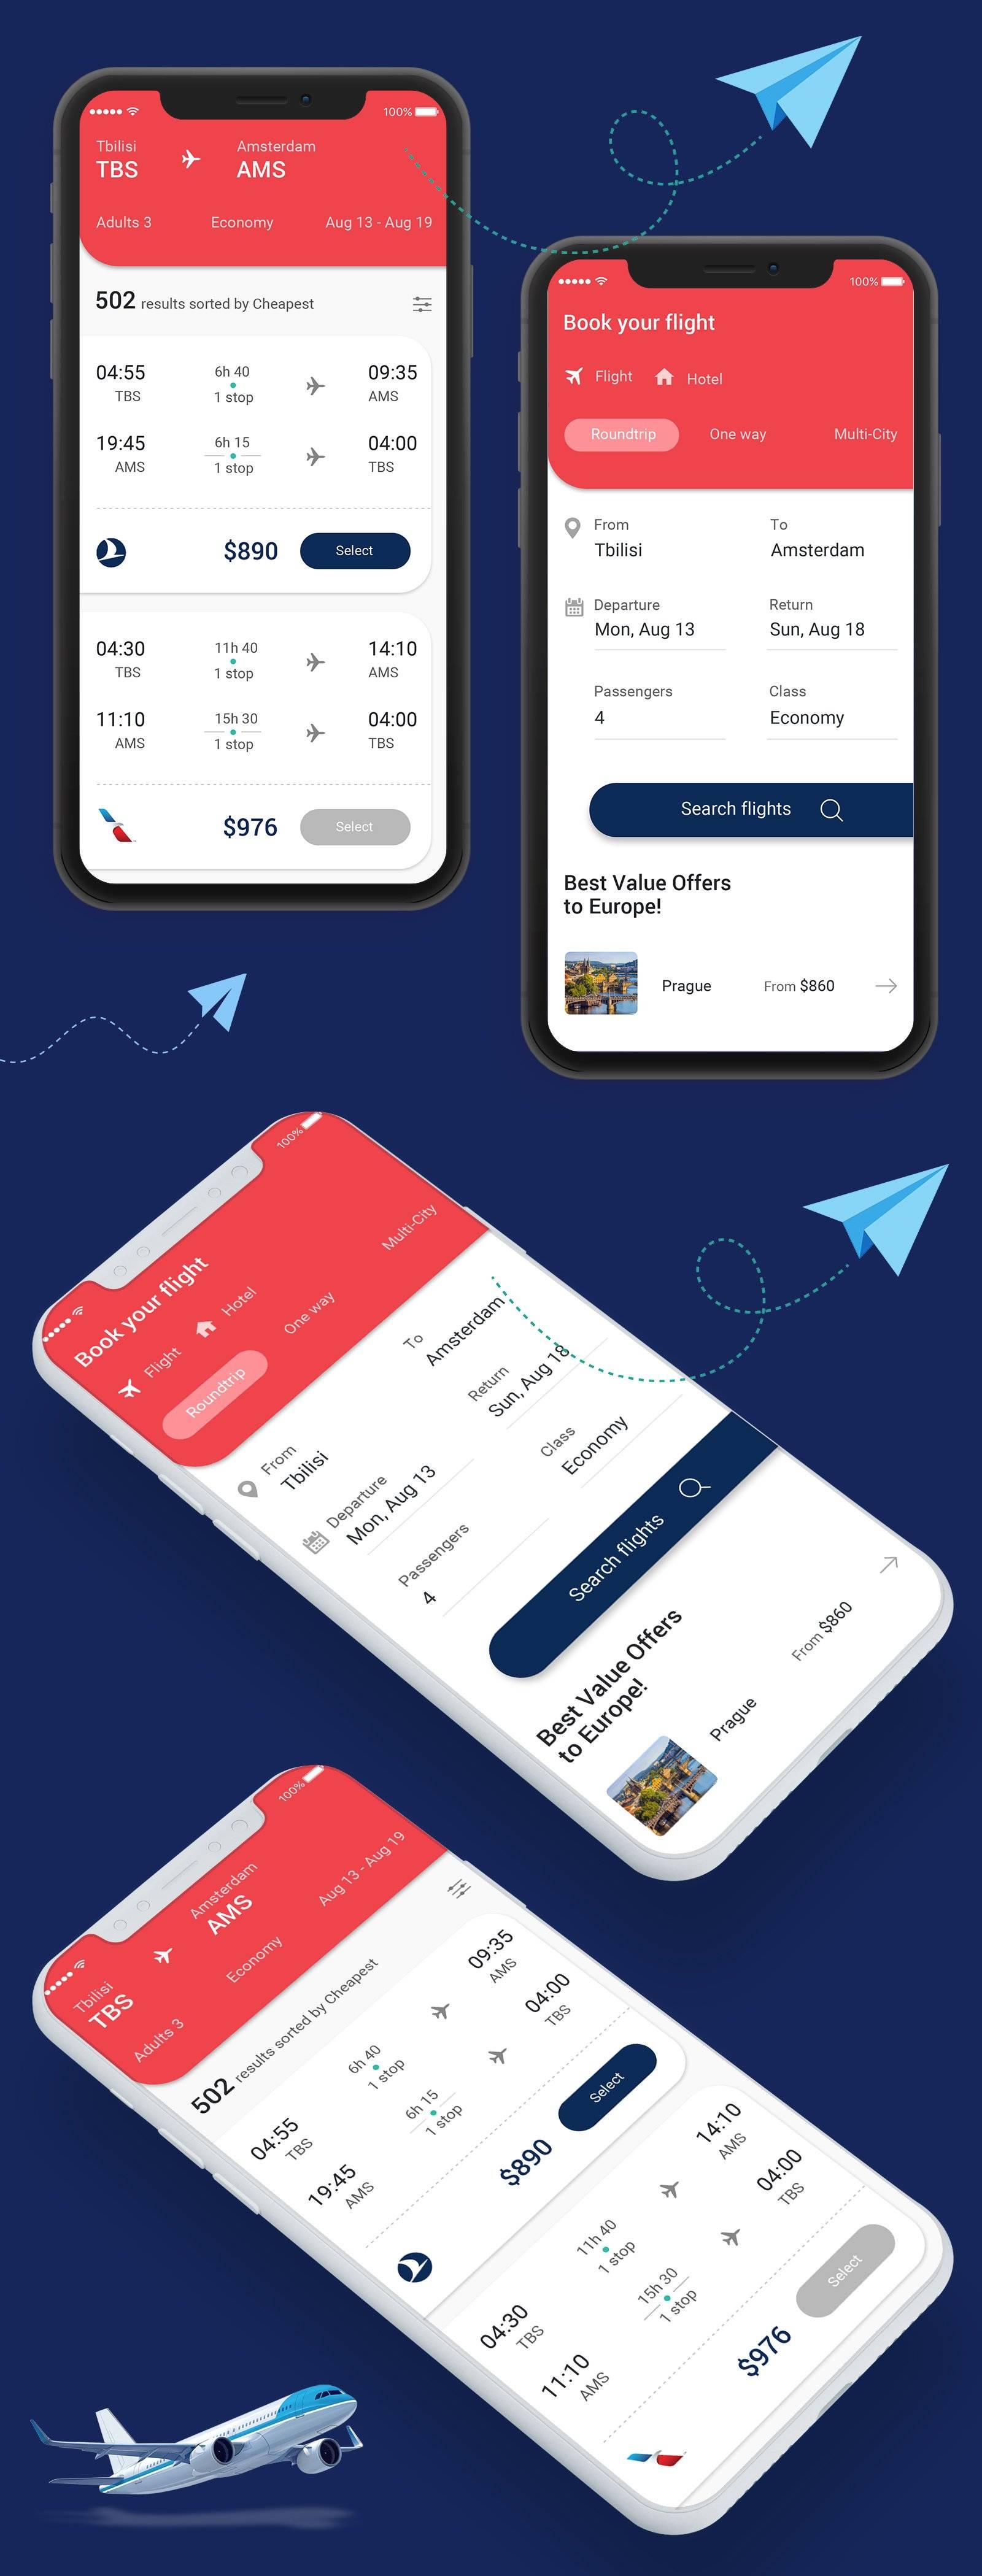 Bootstrap旅行订票UI Kit主题包 .xd素材下载 主题包-第1张